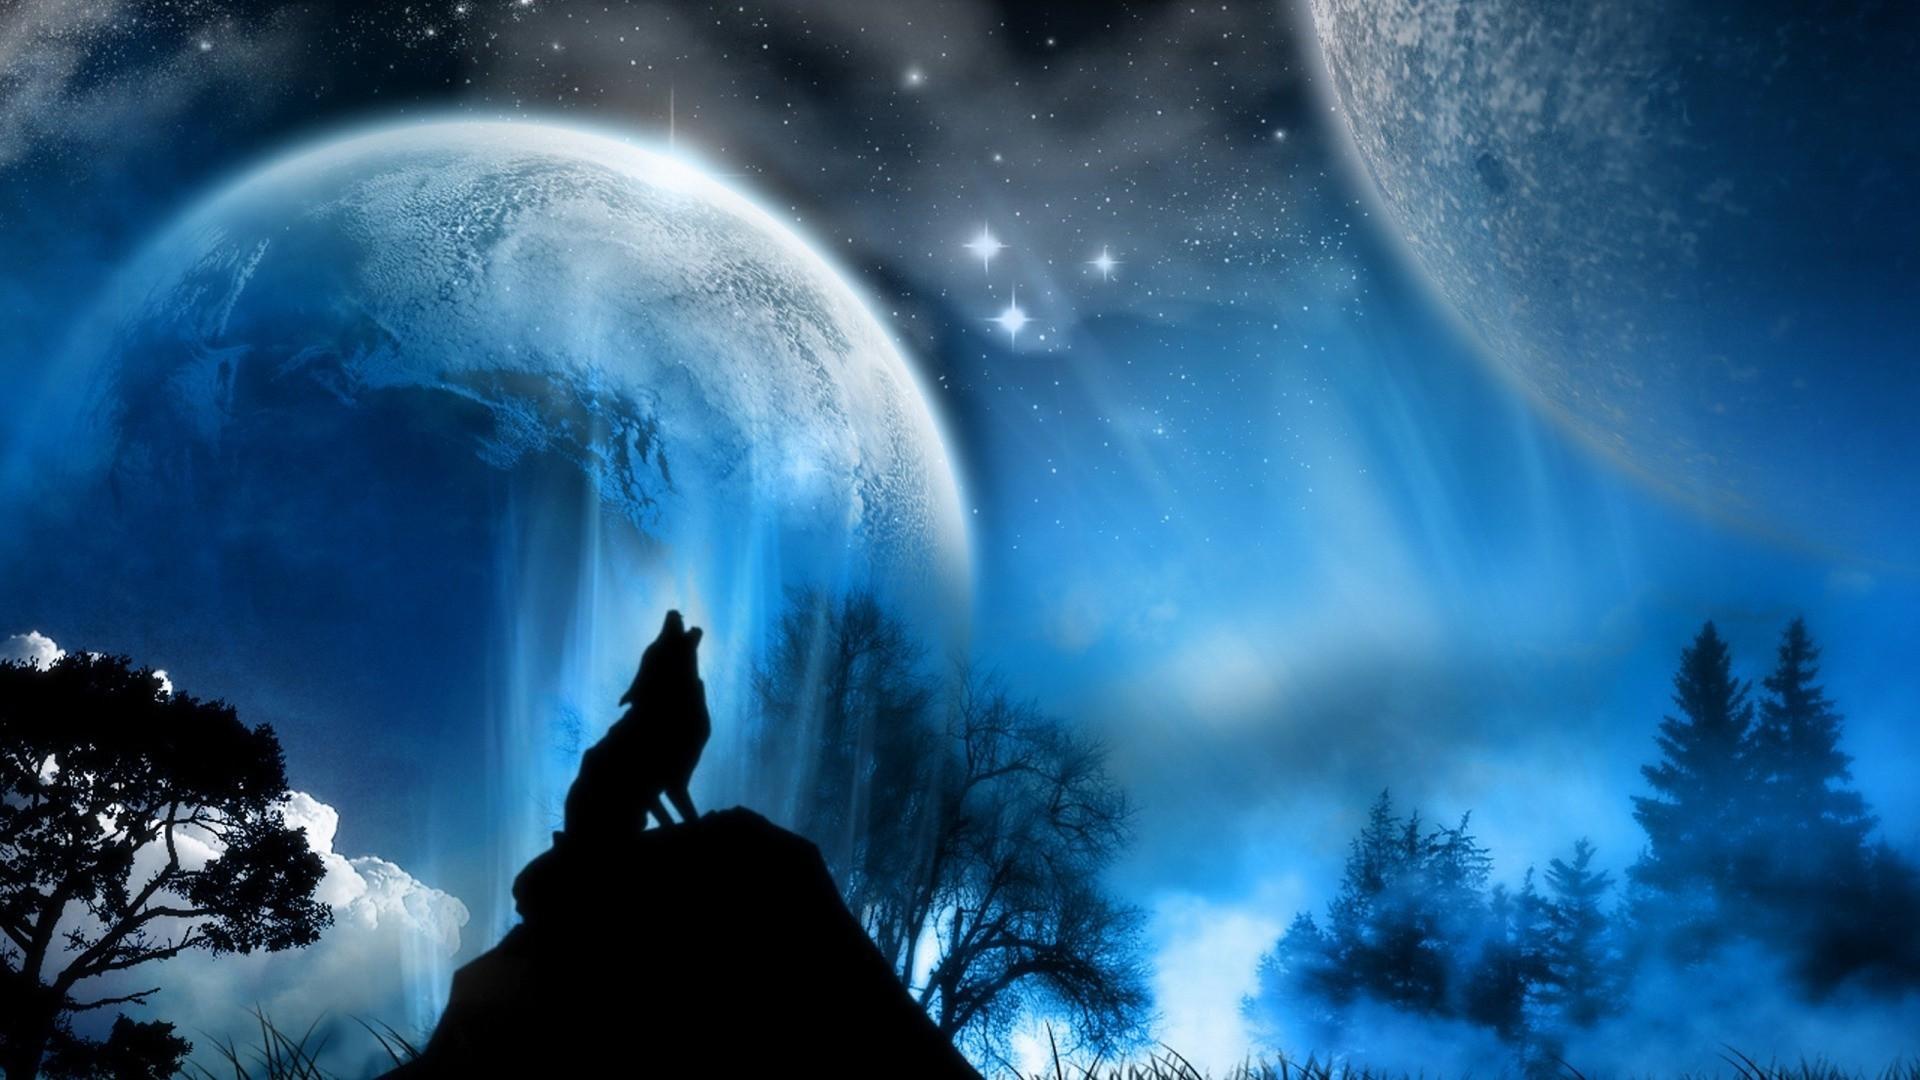 Wolf Howling At The Moon Drawing at GetDrawings | Free ...